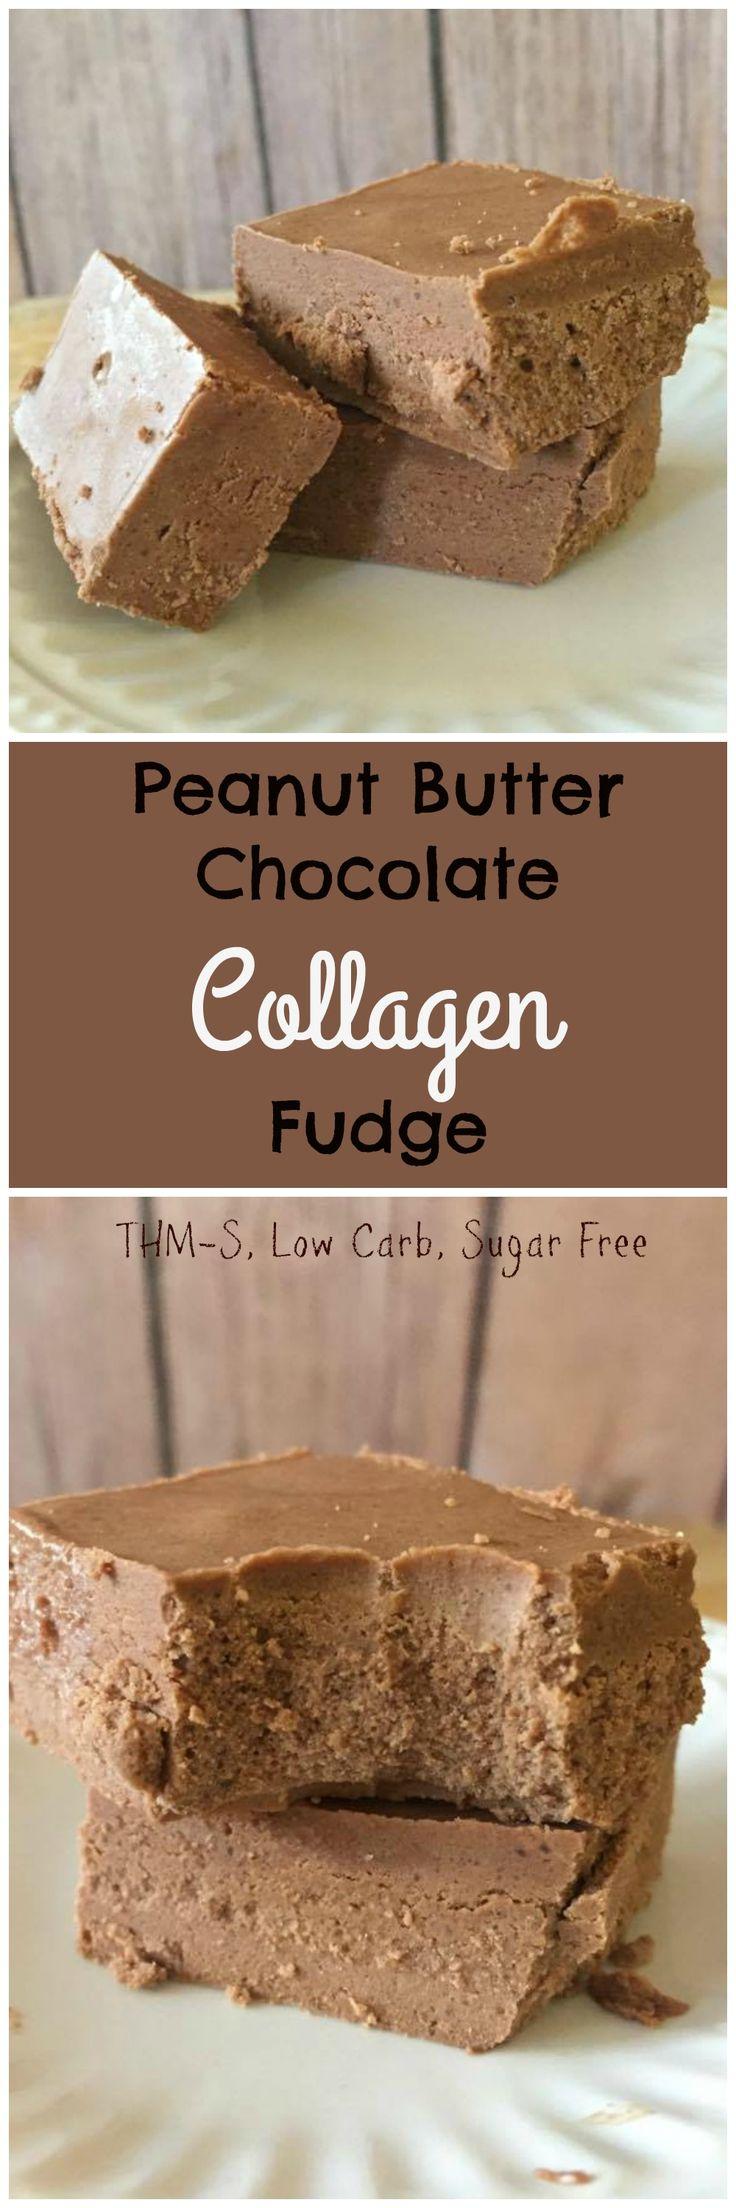 recipe: thm approved peanut butter [19]